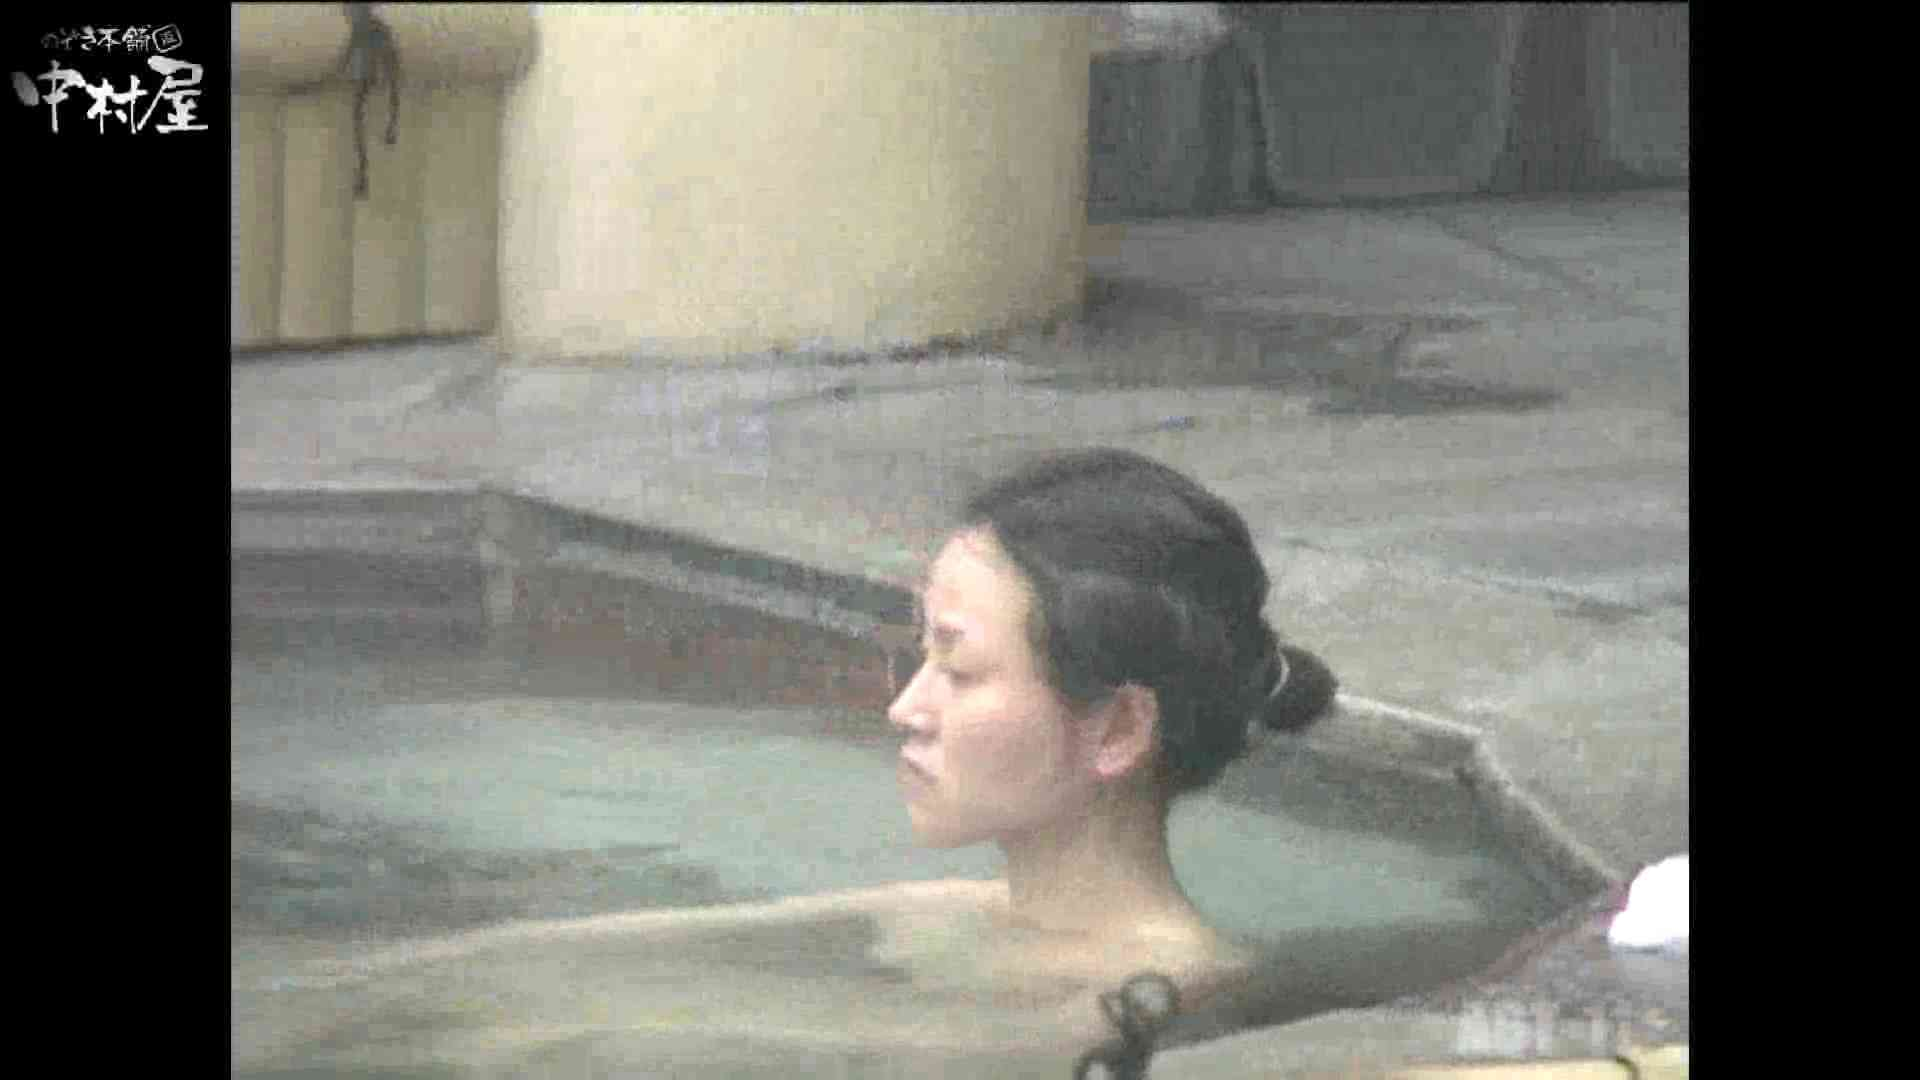 Aquaな露天風呂Vol.875潜入盗撮露天風呂十一判湯 其の四 OLのエロ生活 エロ画像 65連発 2